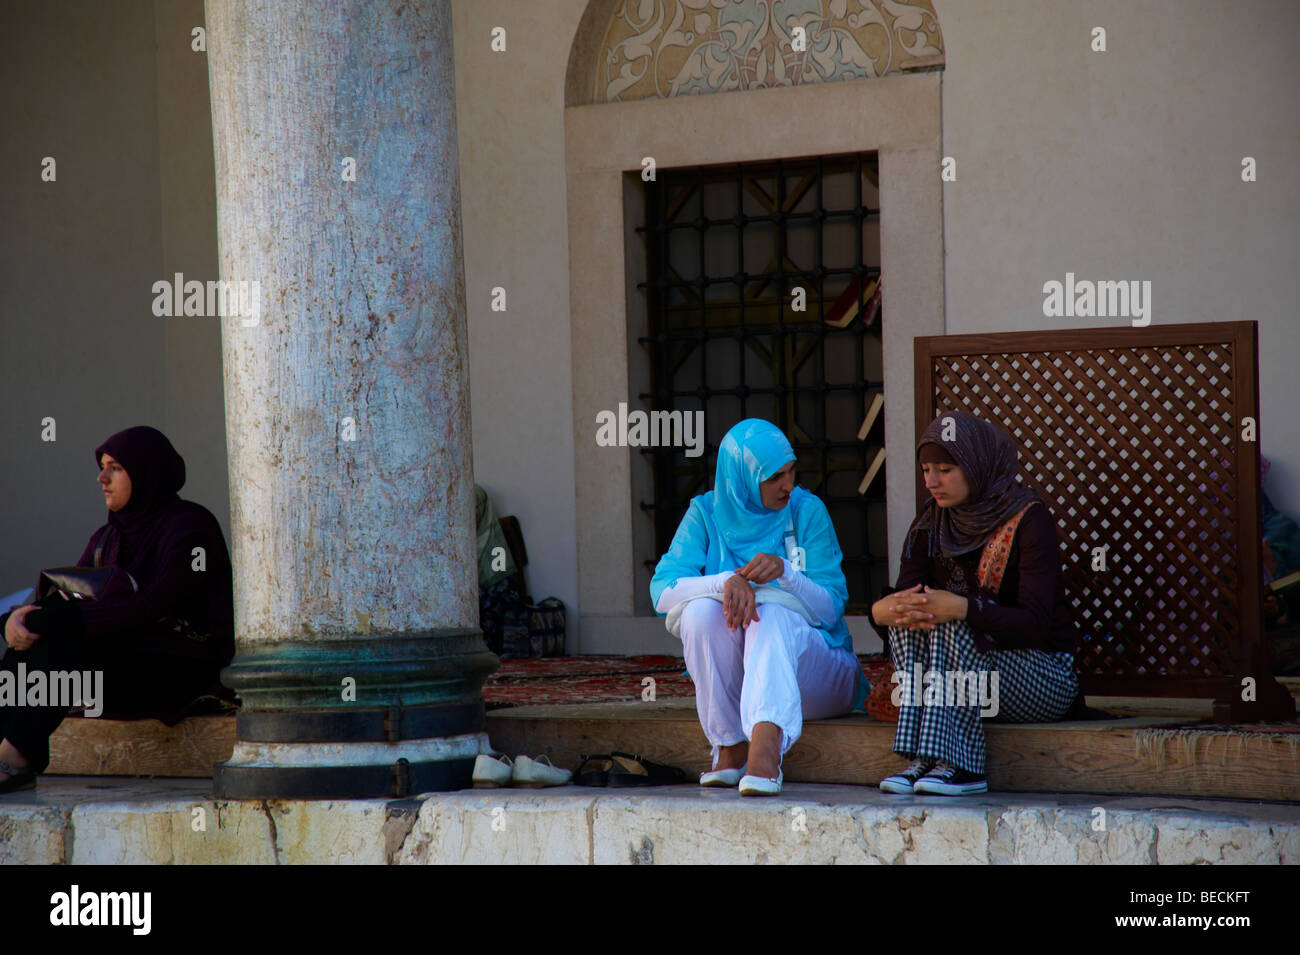 Women meet at the Mosque Sarajevo, Bosnia - Stock Image